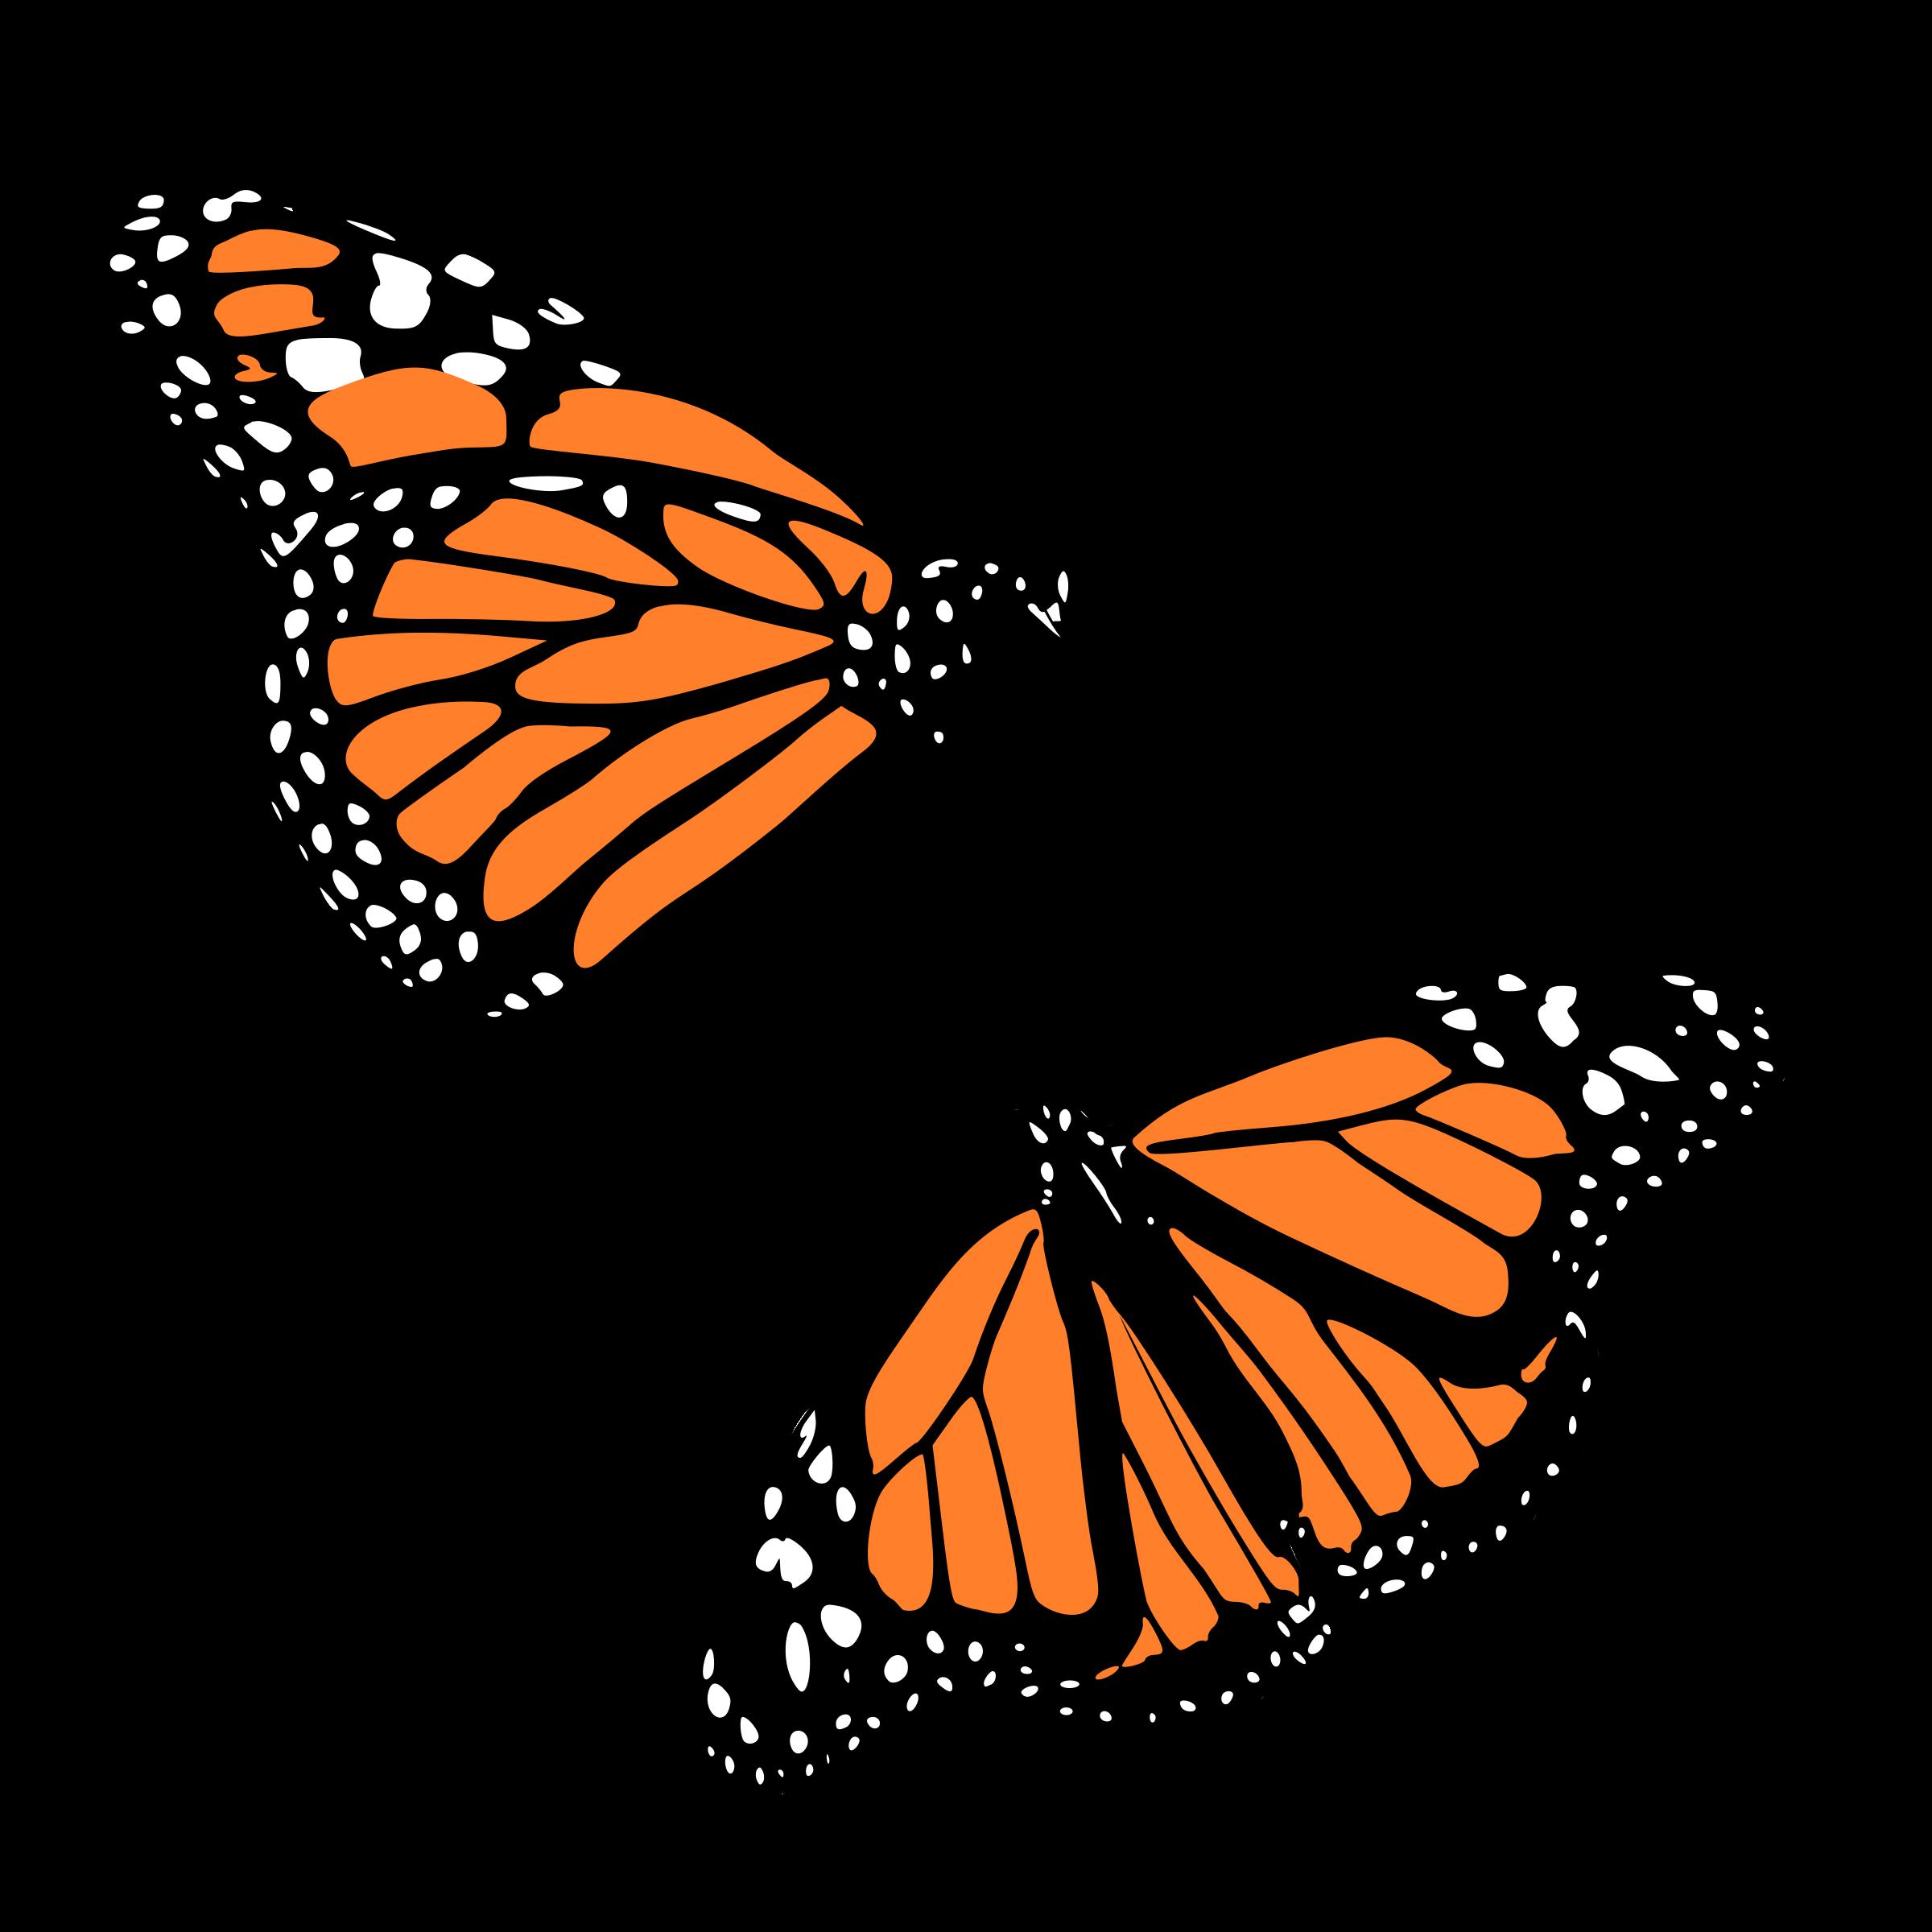 Kite clipart butterfly. Monarch butterflies big image